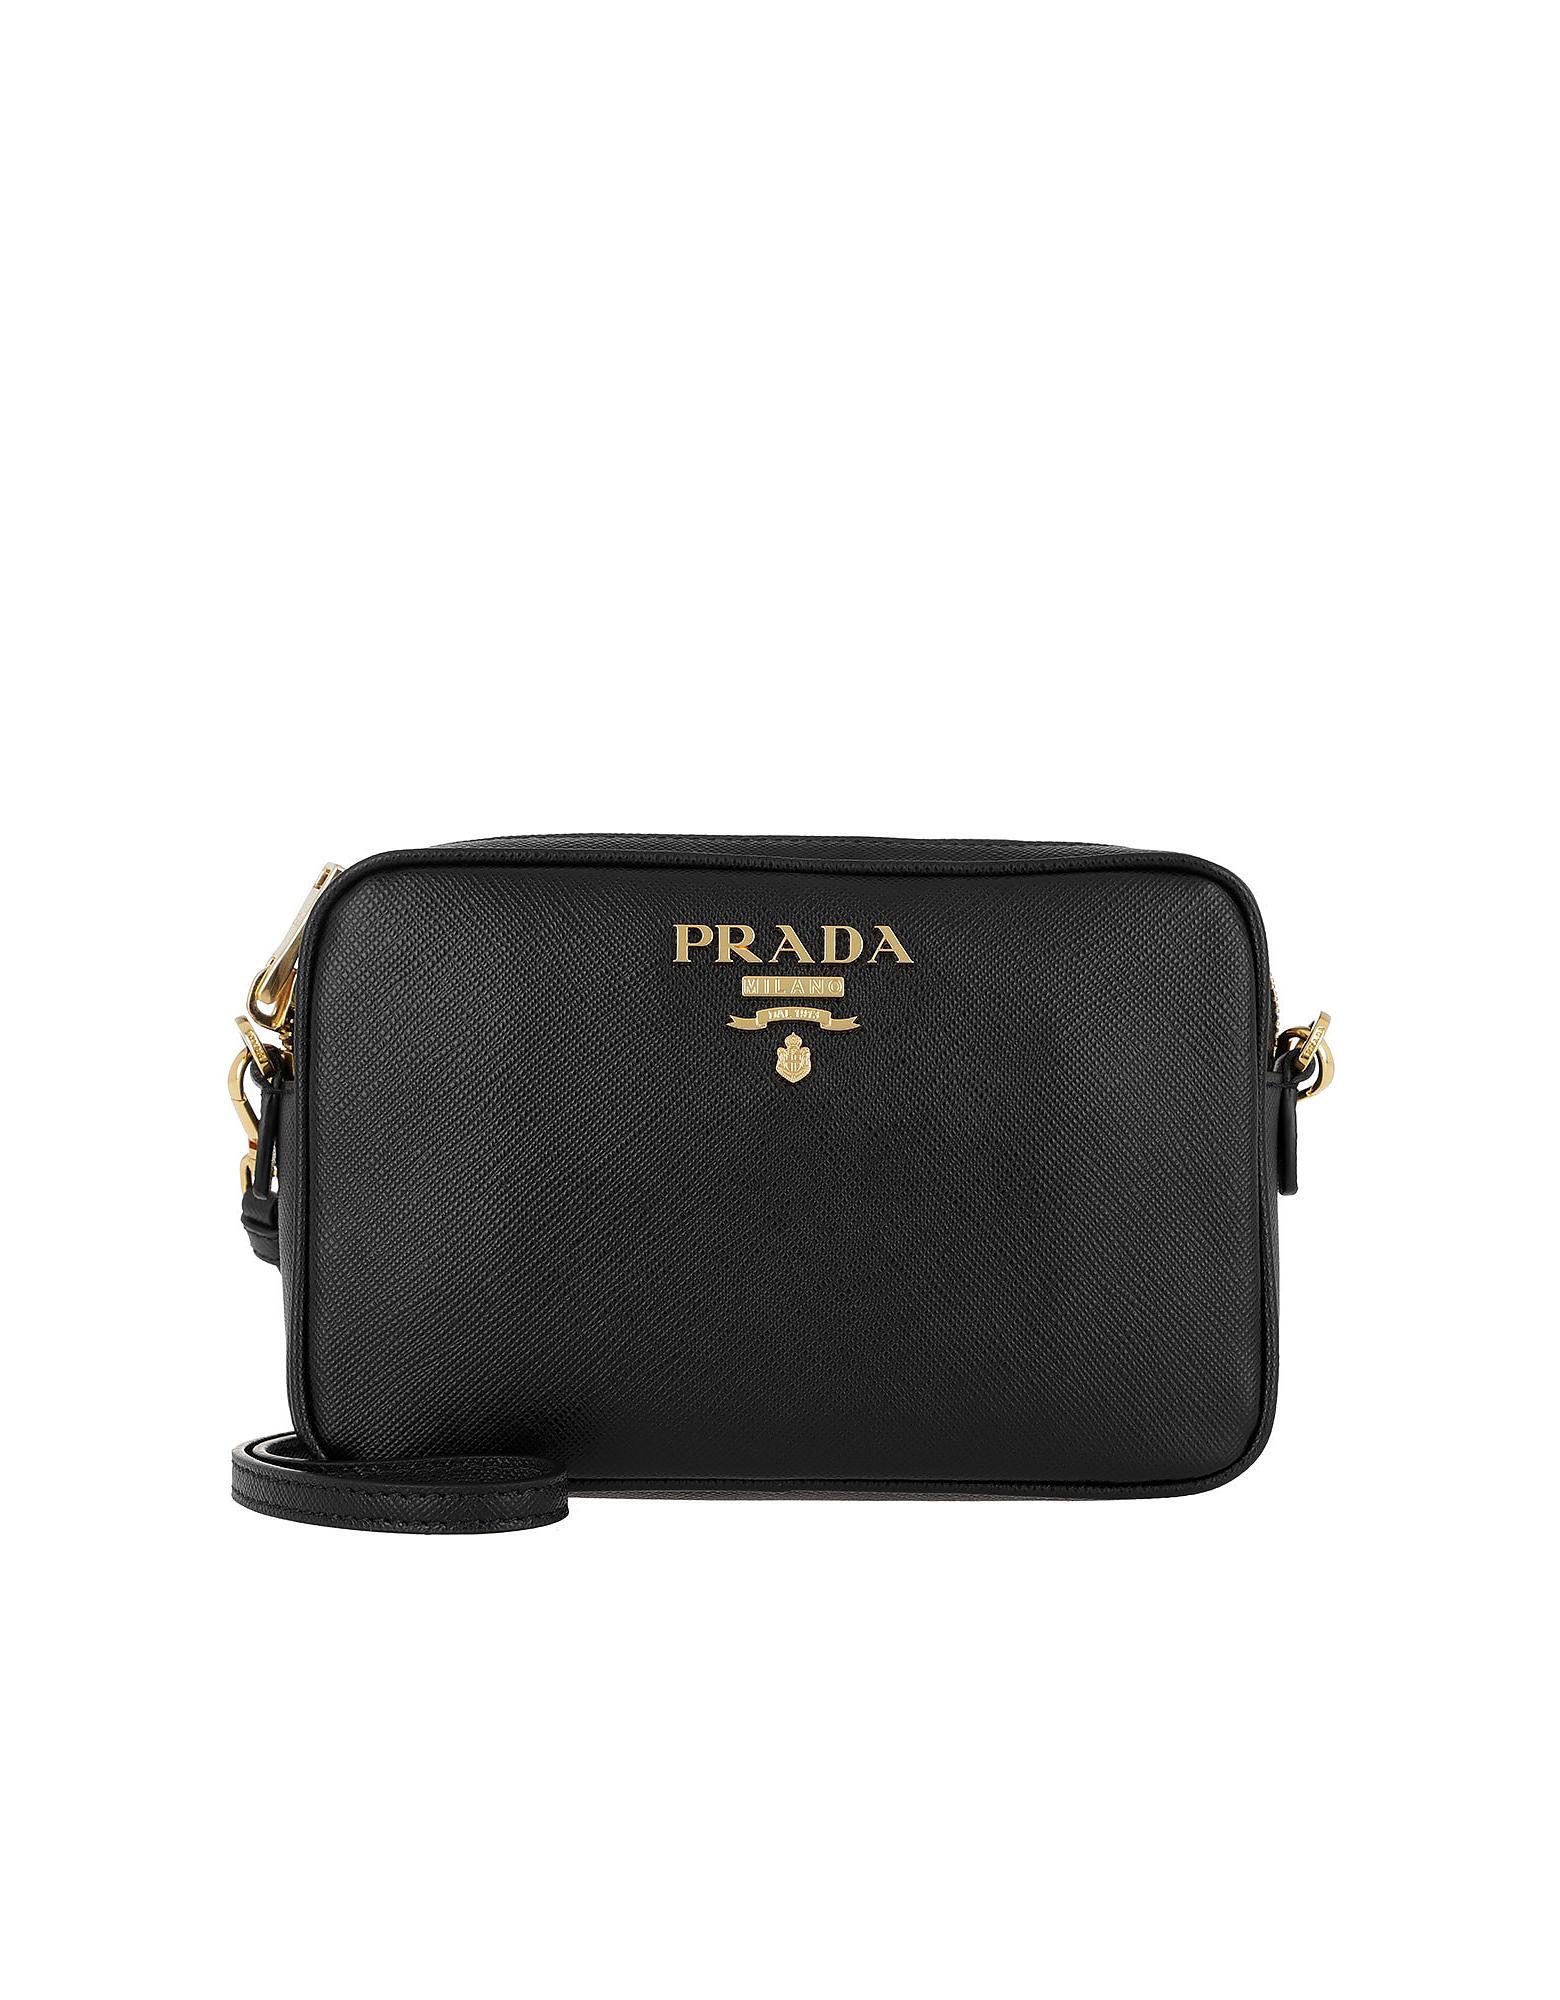 76f953ee12f2 ... norway prada medium saffiano leather black camera bag lyst. view  fullscreen 2ece2 d35ff